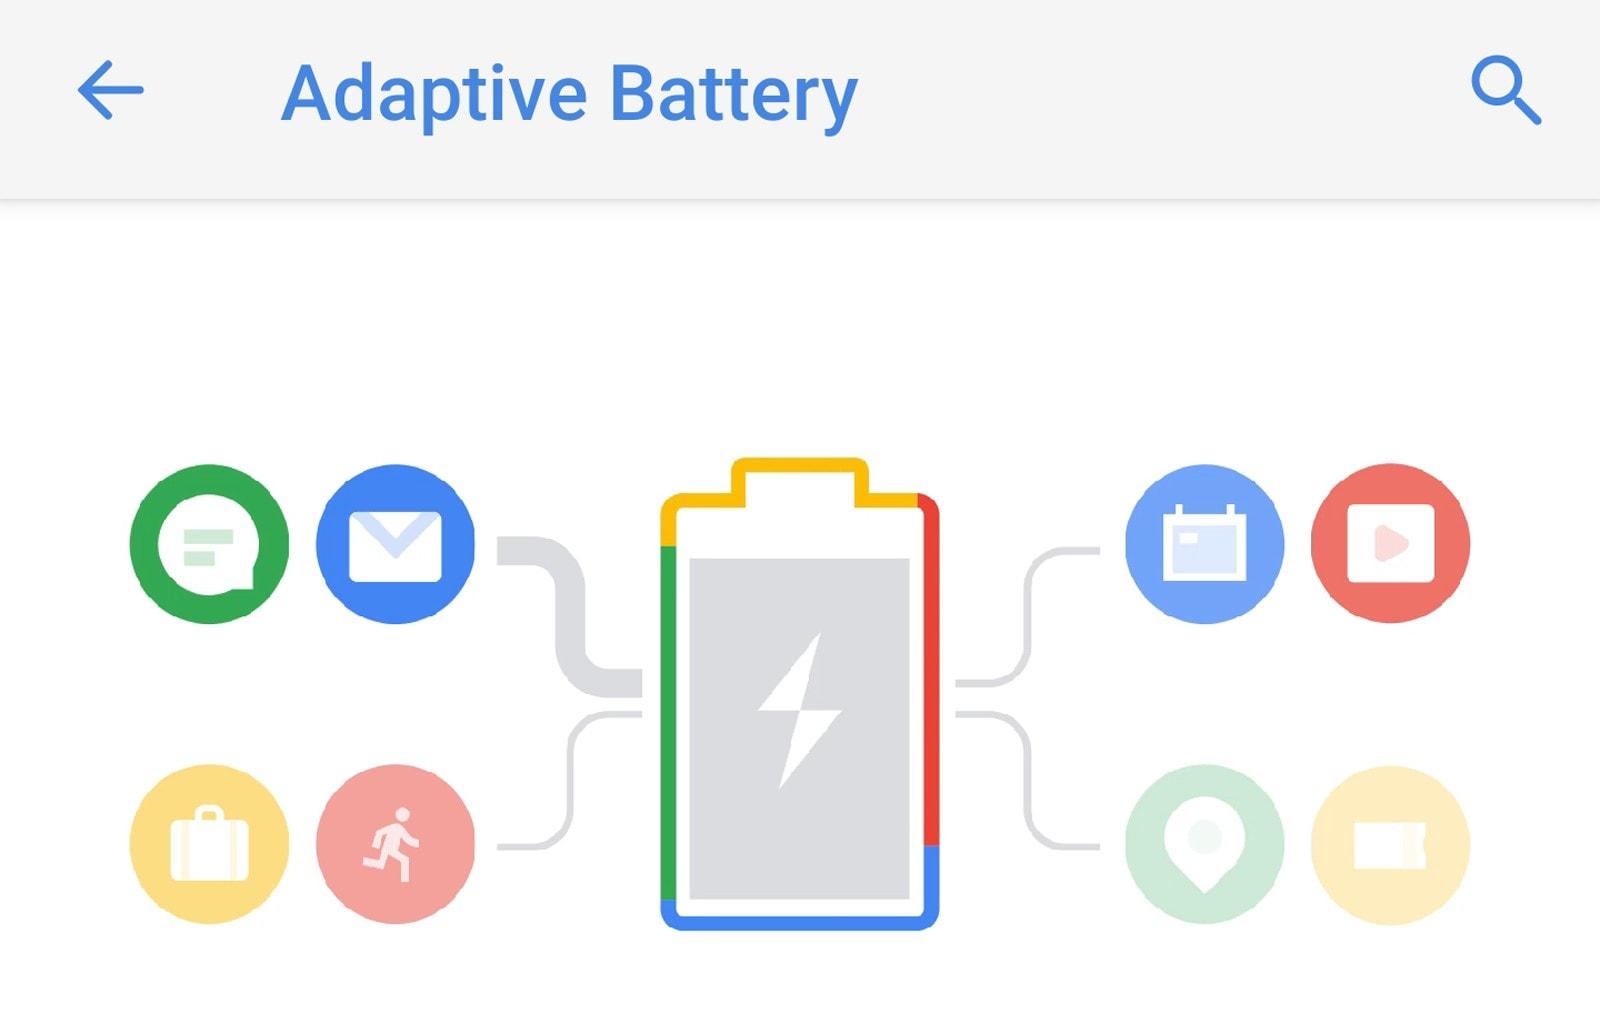 Bateria adaptativa